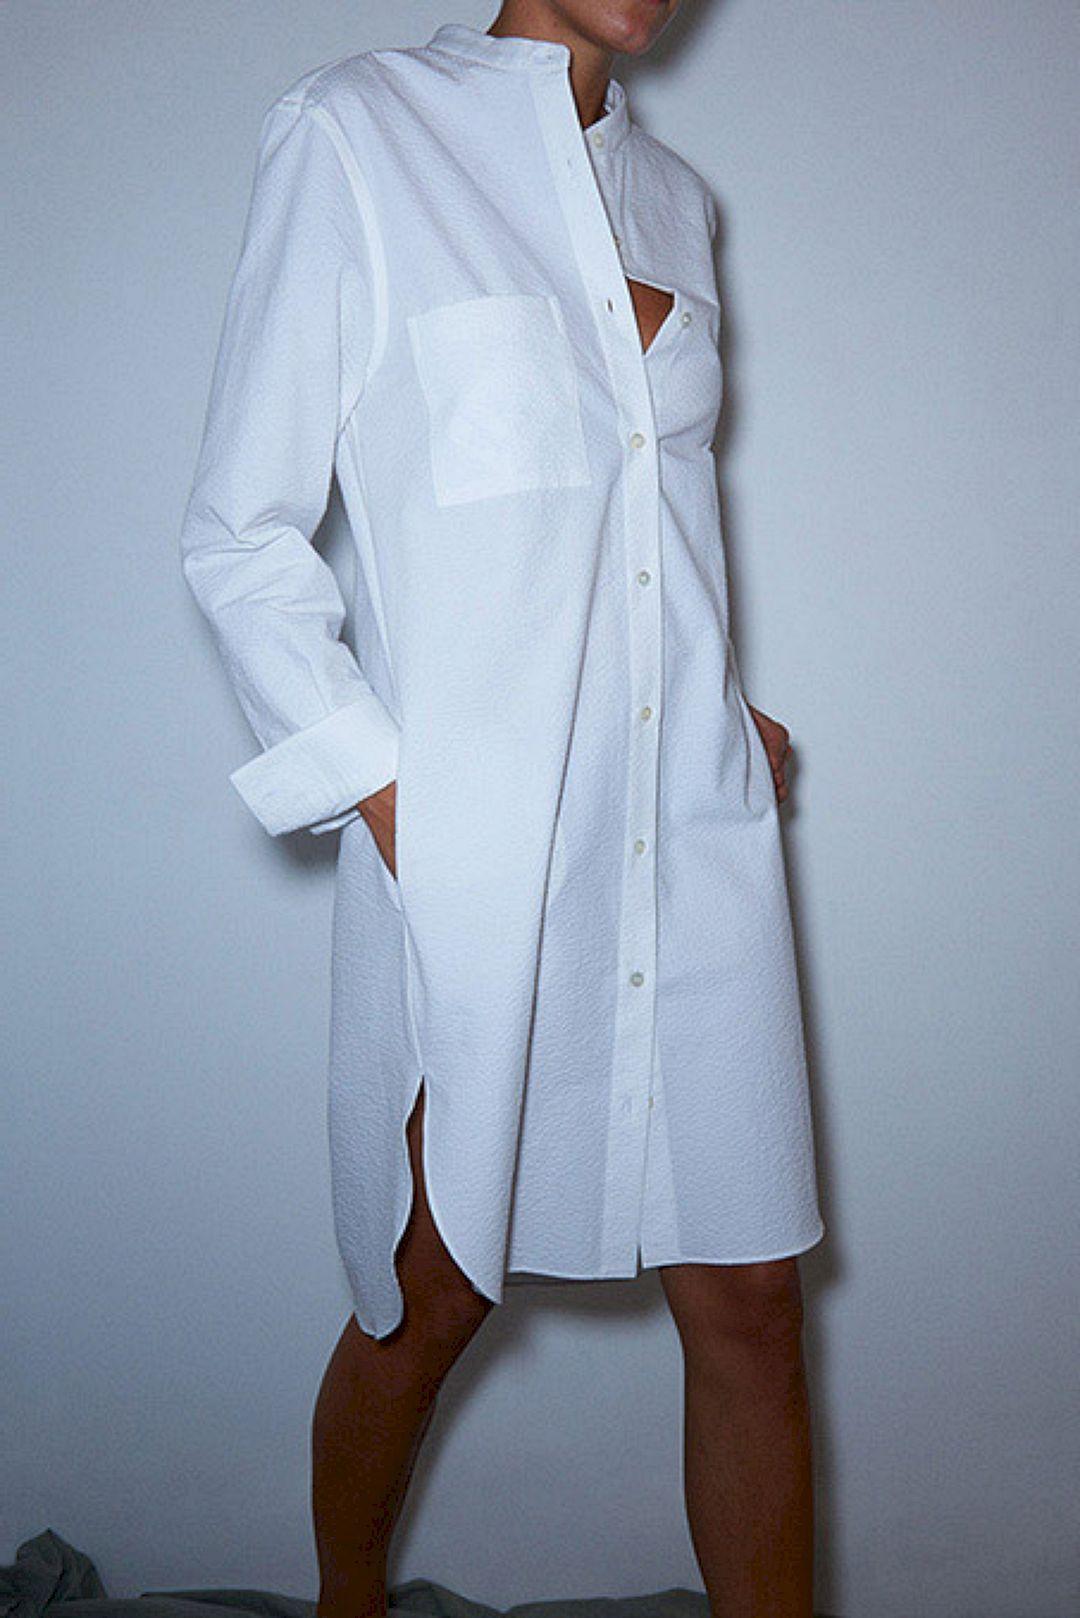 Stunning 45 Perfectly Chic Women's White Shirts Spring Summer Inspiration https://www.tukuoke.com/45-perfectly-chic-womens-white-shirts-spring-summer-inspiration-2450